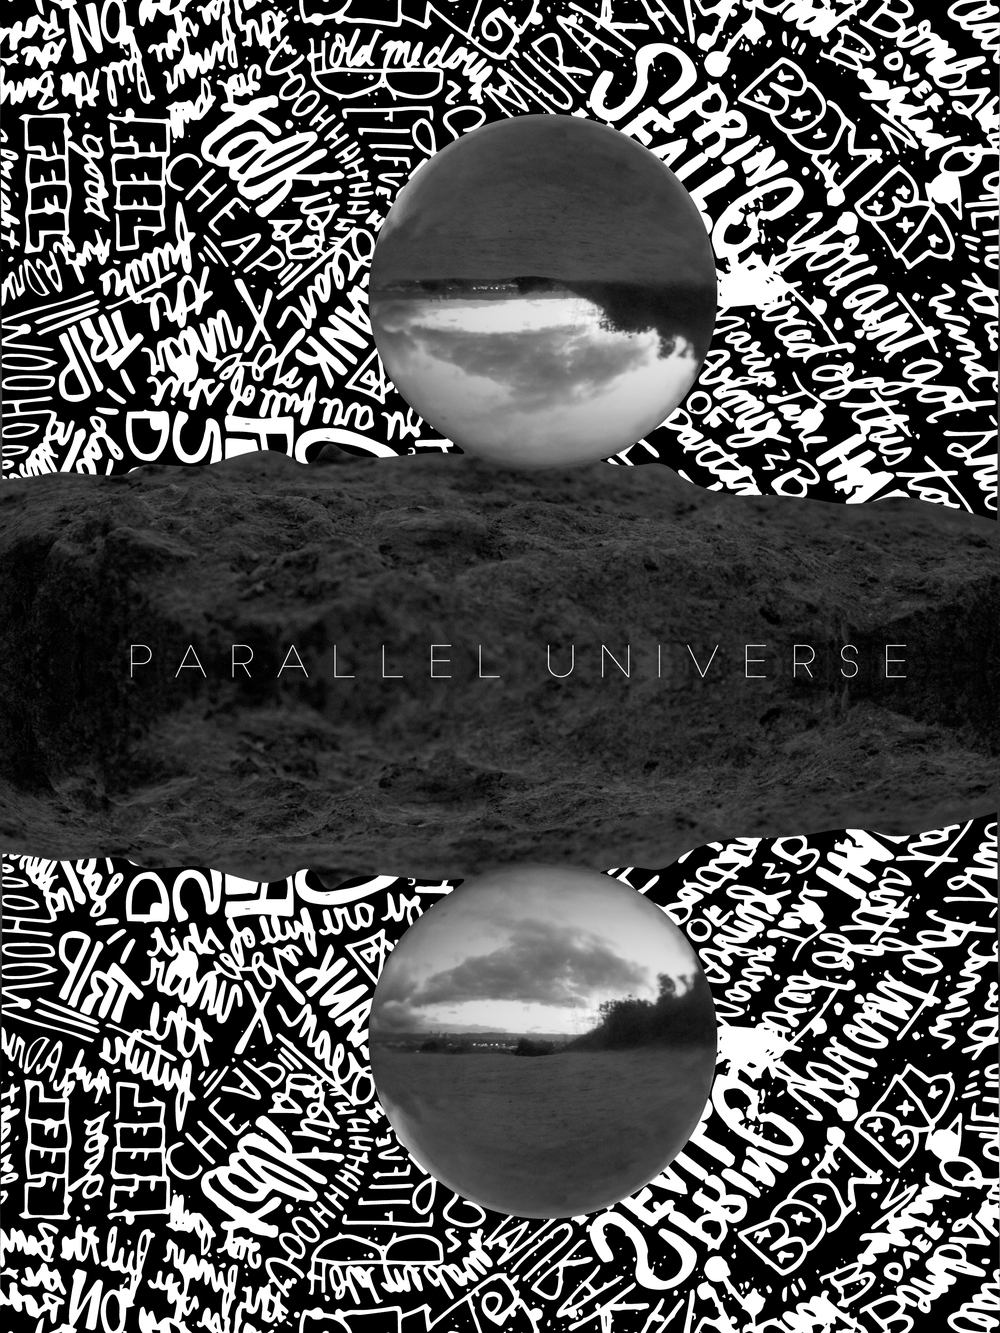 PARALLELUNIVERSE-01.jpg